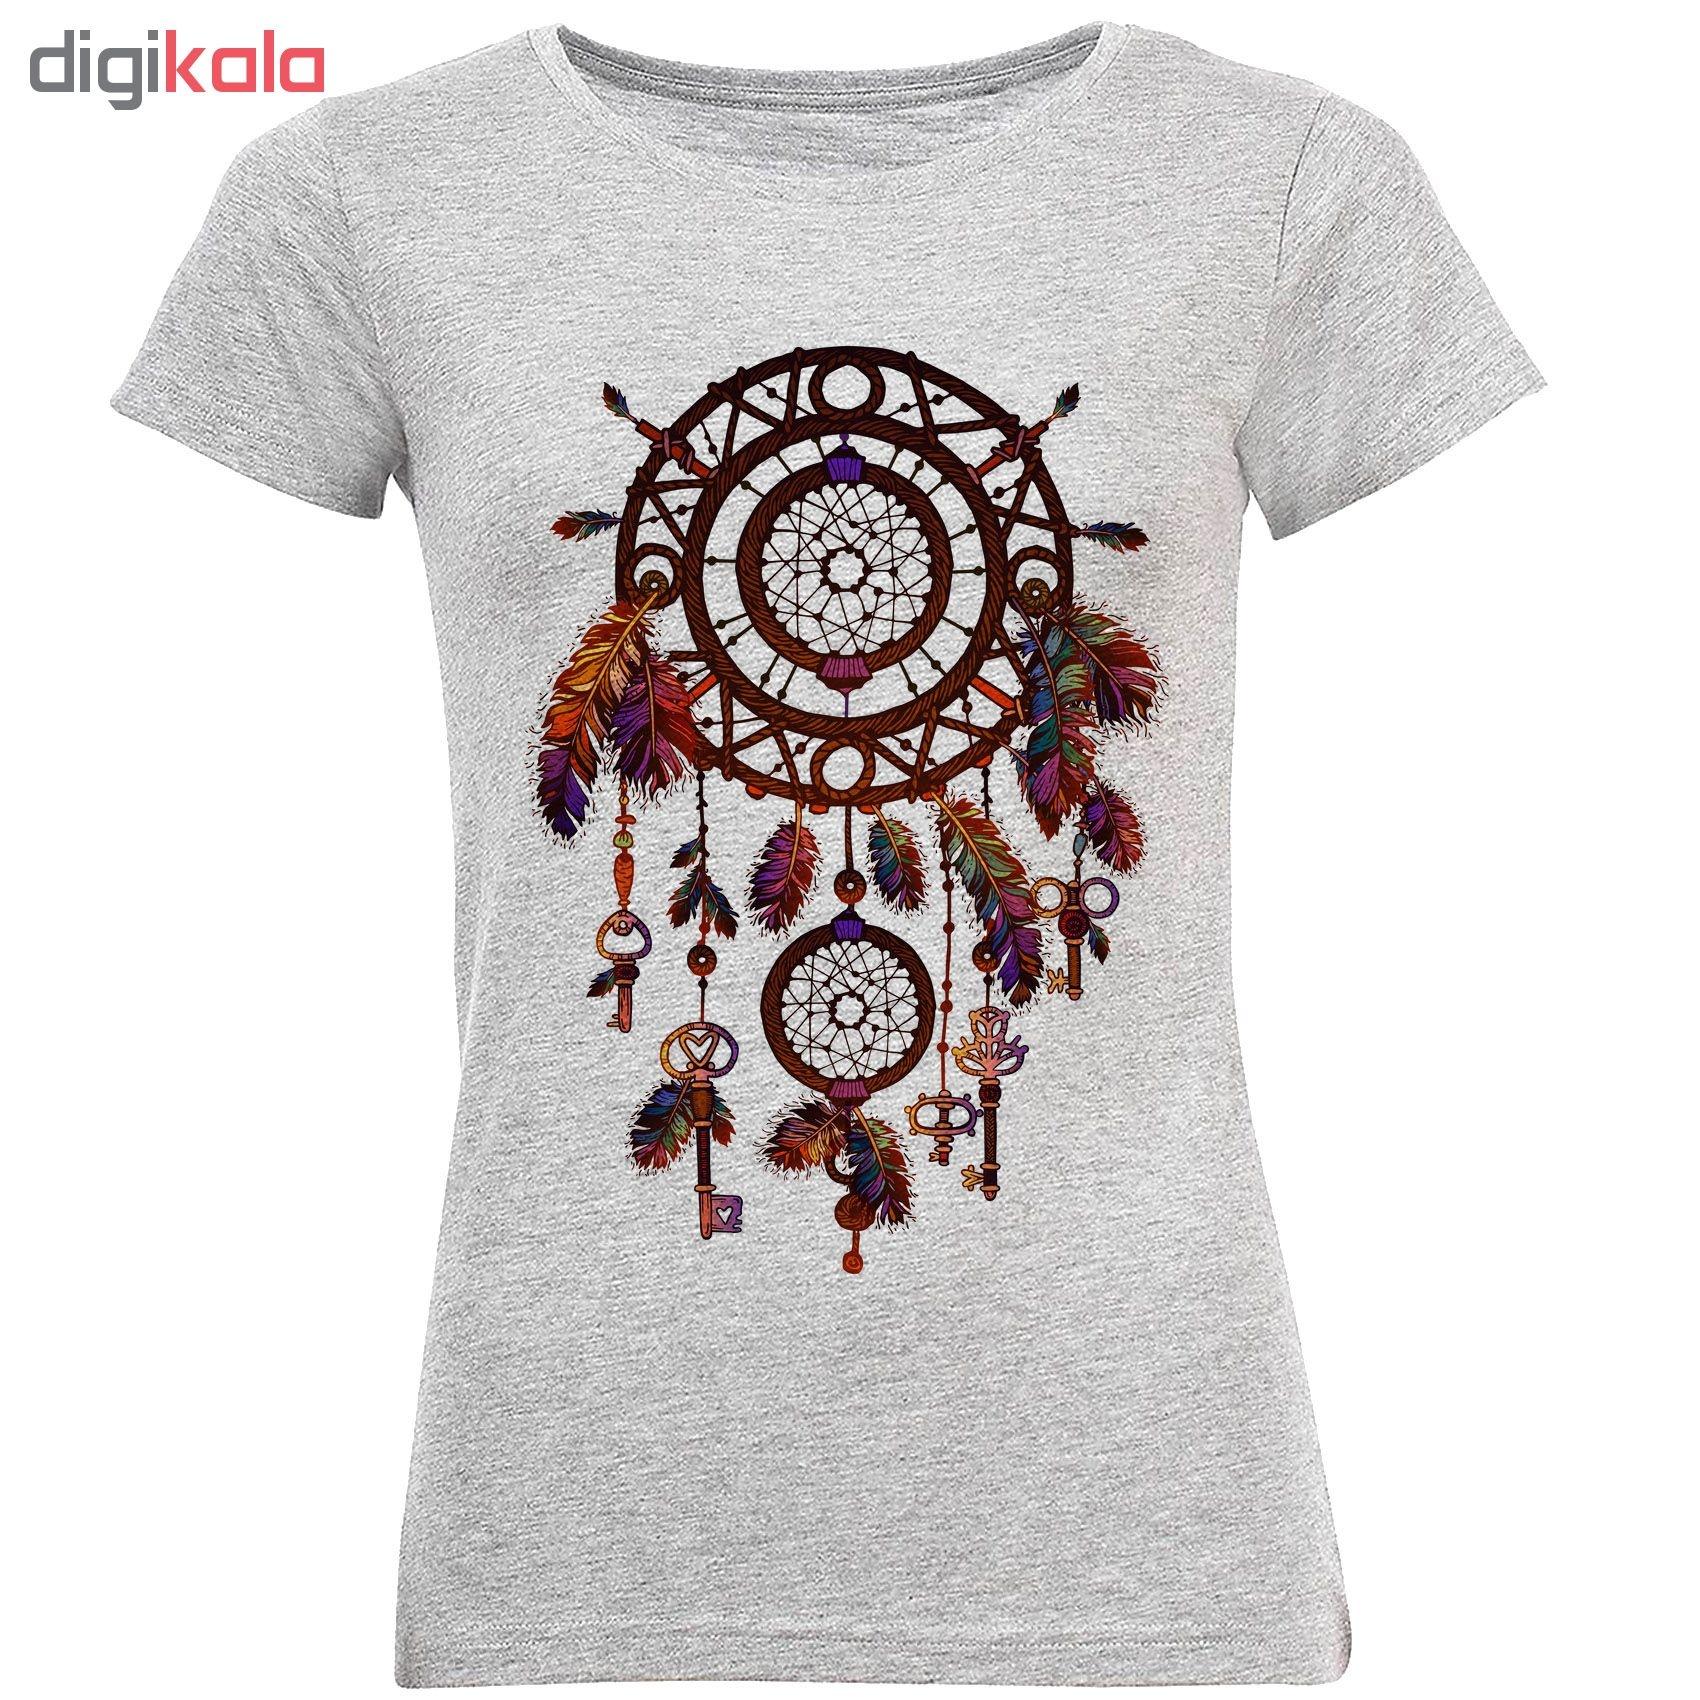 تی شرت آستین کوتاه زنانه طرح دریم کچر کد S289 main 1 1